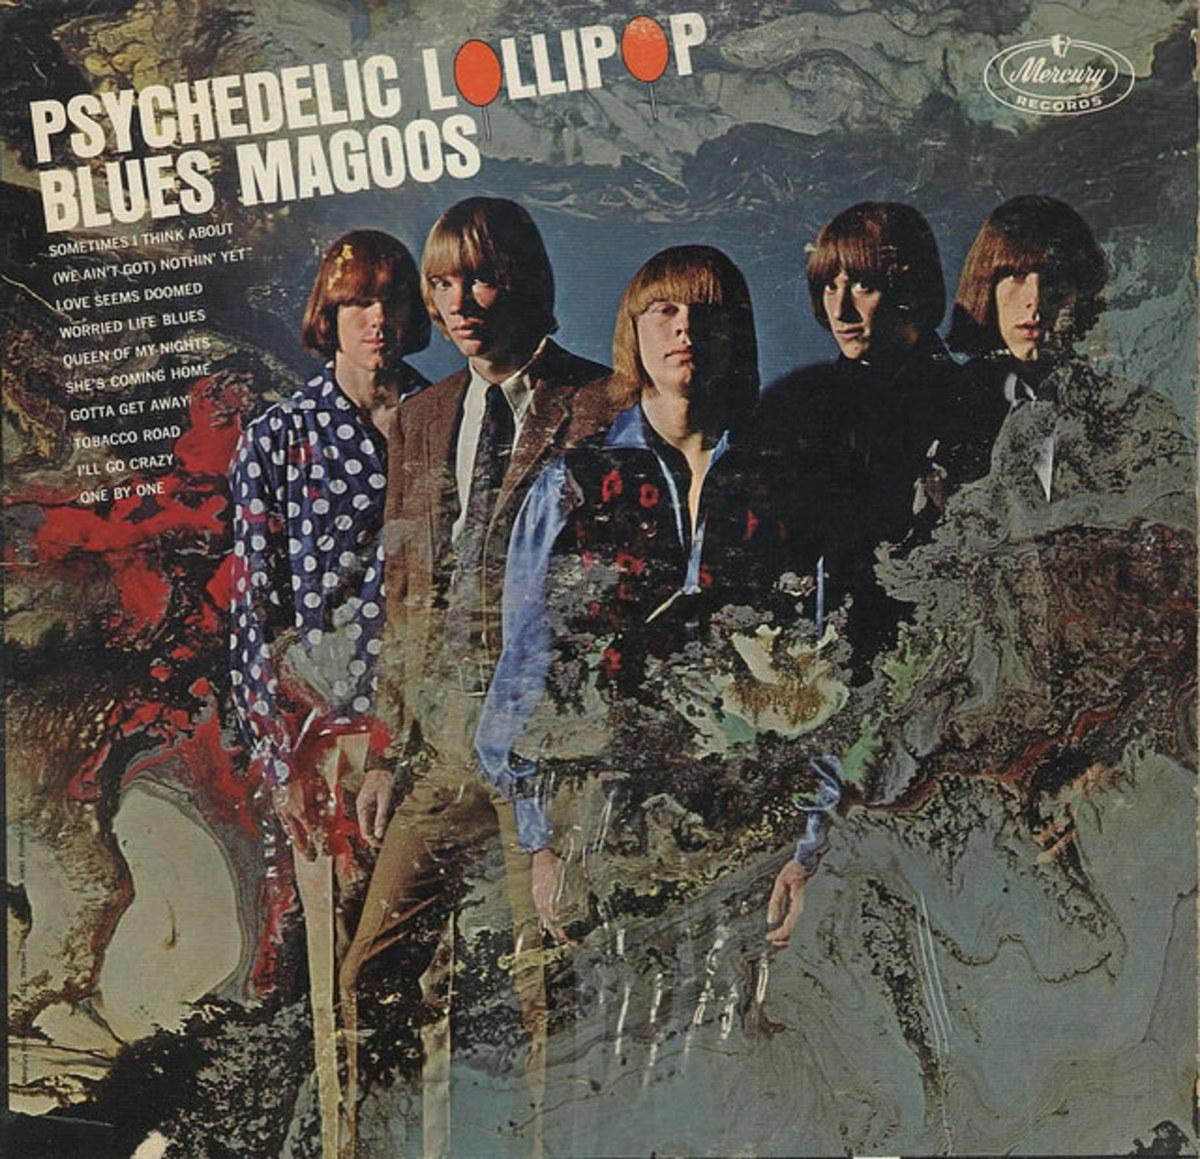 "Blues Magoos ""Psychedelic Lollipop"" Mercury Records MG 21096 12"" LP Vinyl Record, US Pressing (1966)"